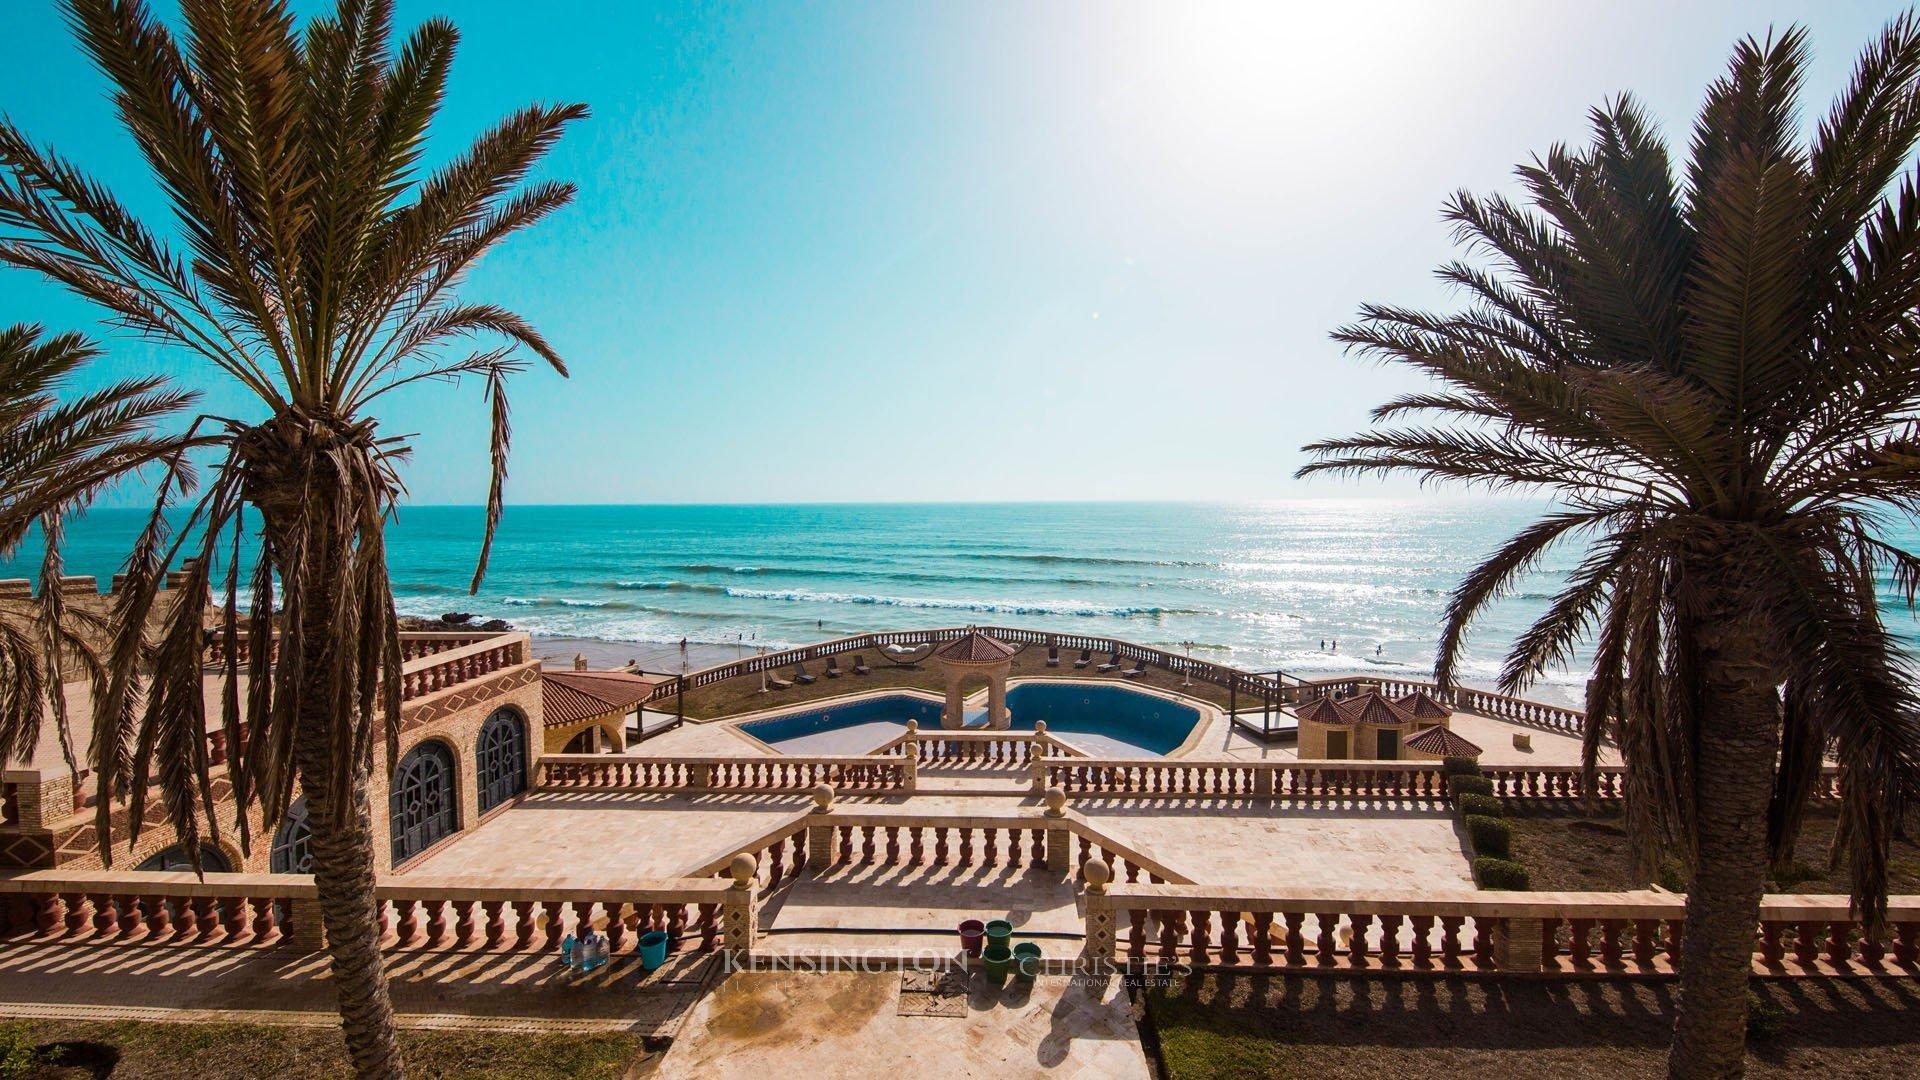 KPPM00849: Villa Rama Luxury Villa Agadir Morocco